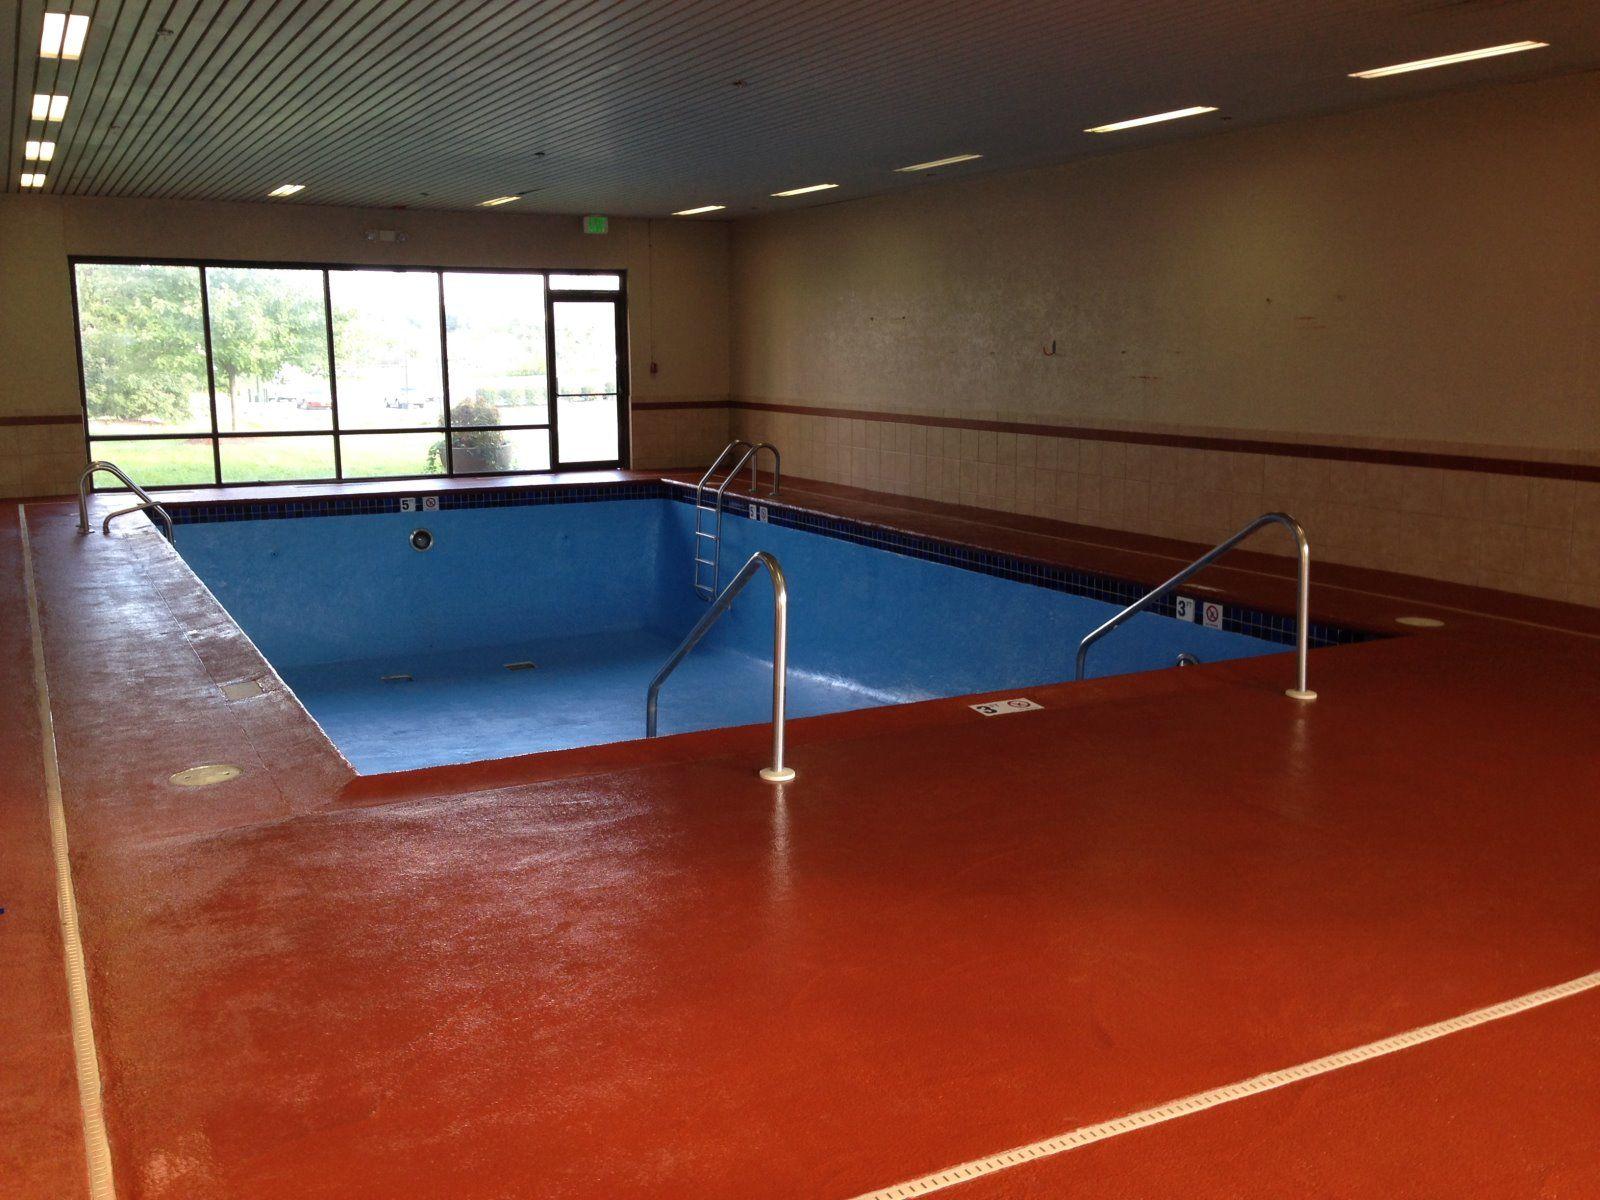 Hampton Inn Swimming Pool and Deck Sandblasted and Epoxy Painted